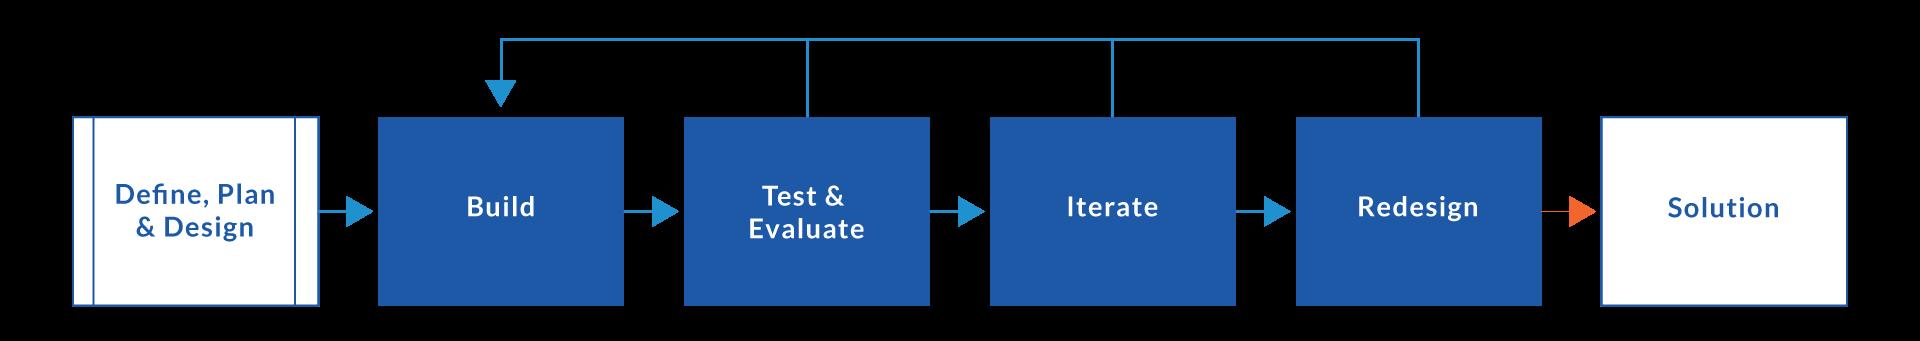 design-process-diagram